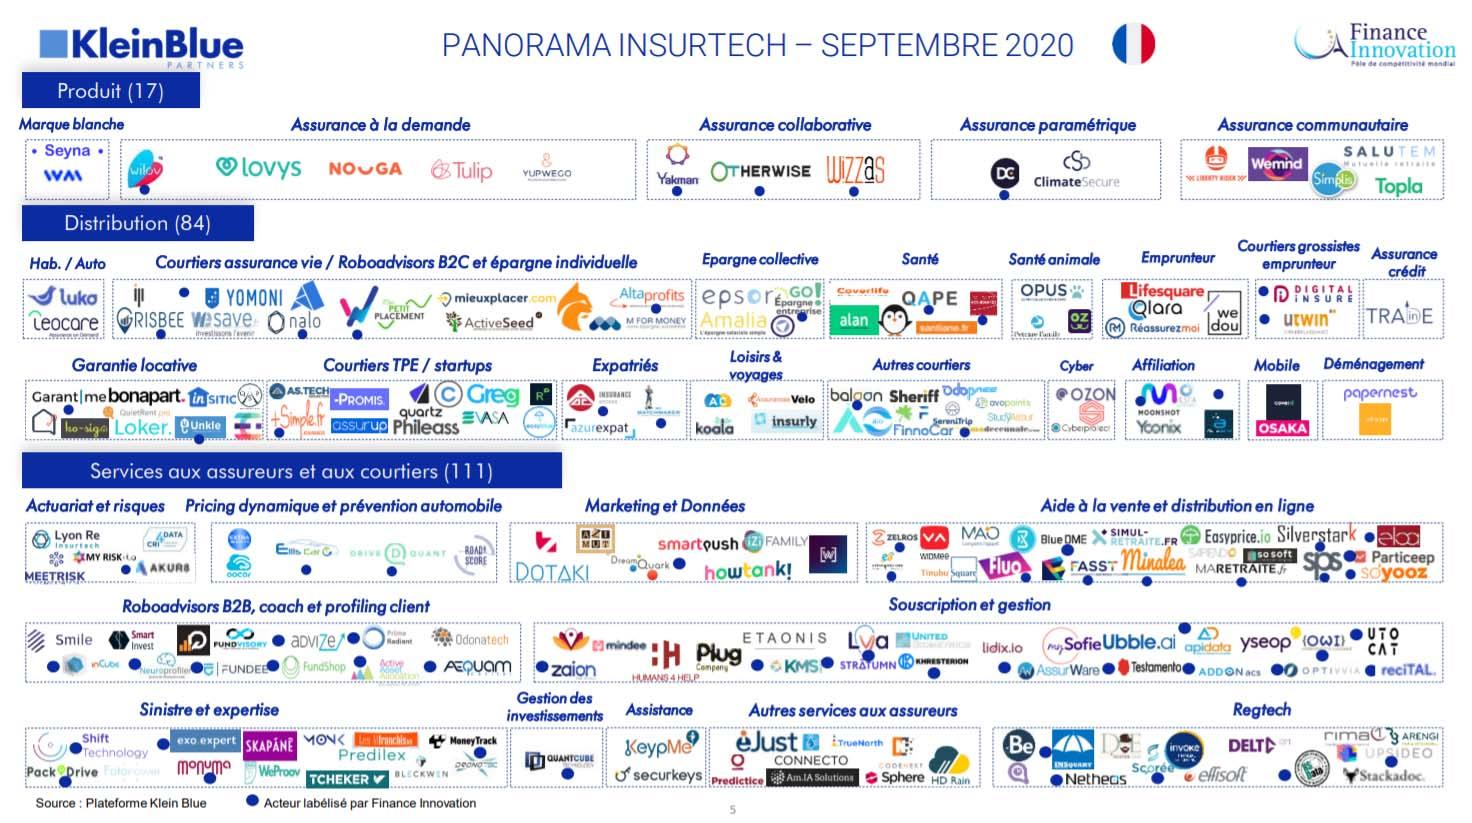 Panorama Assurtech France 2020